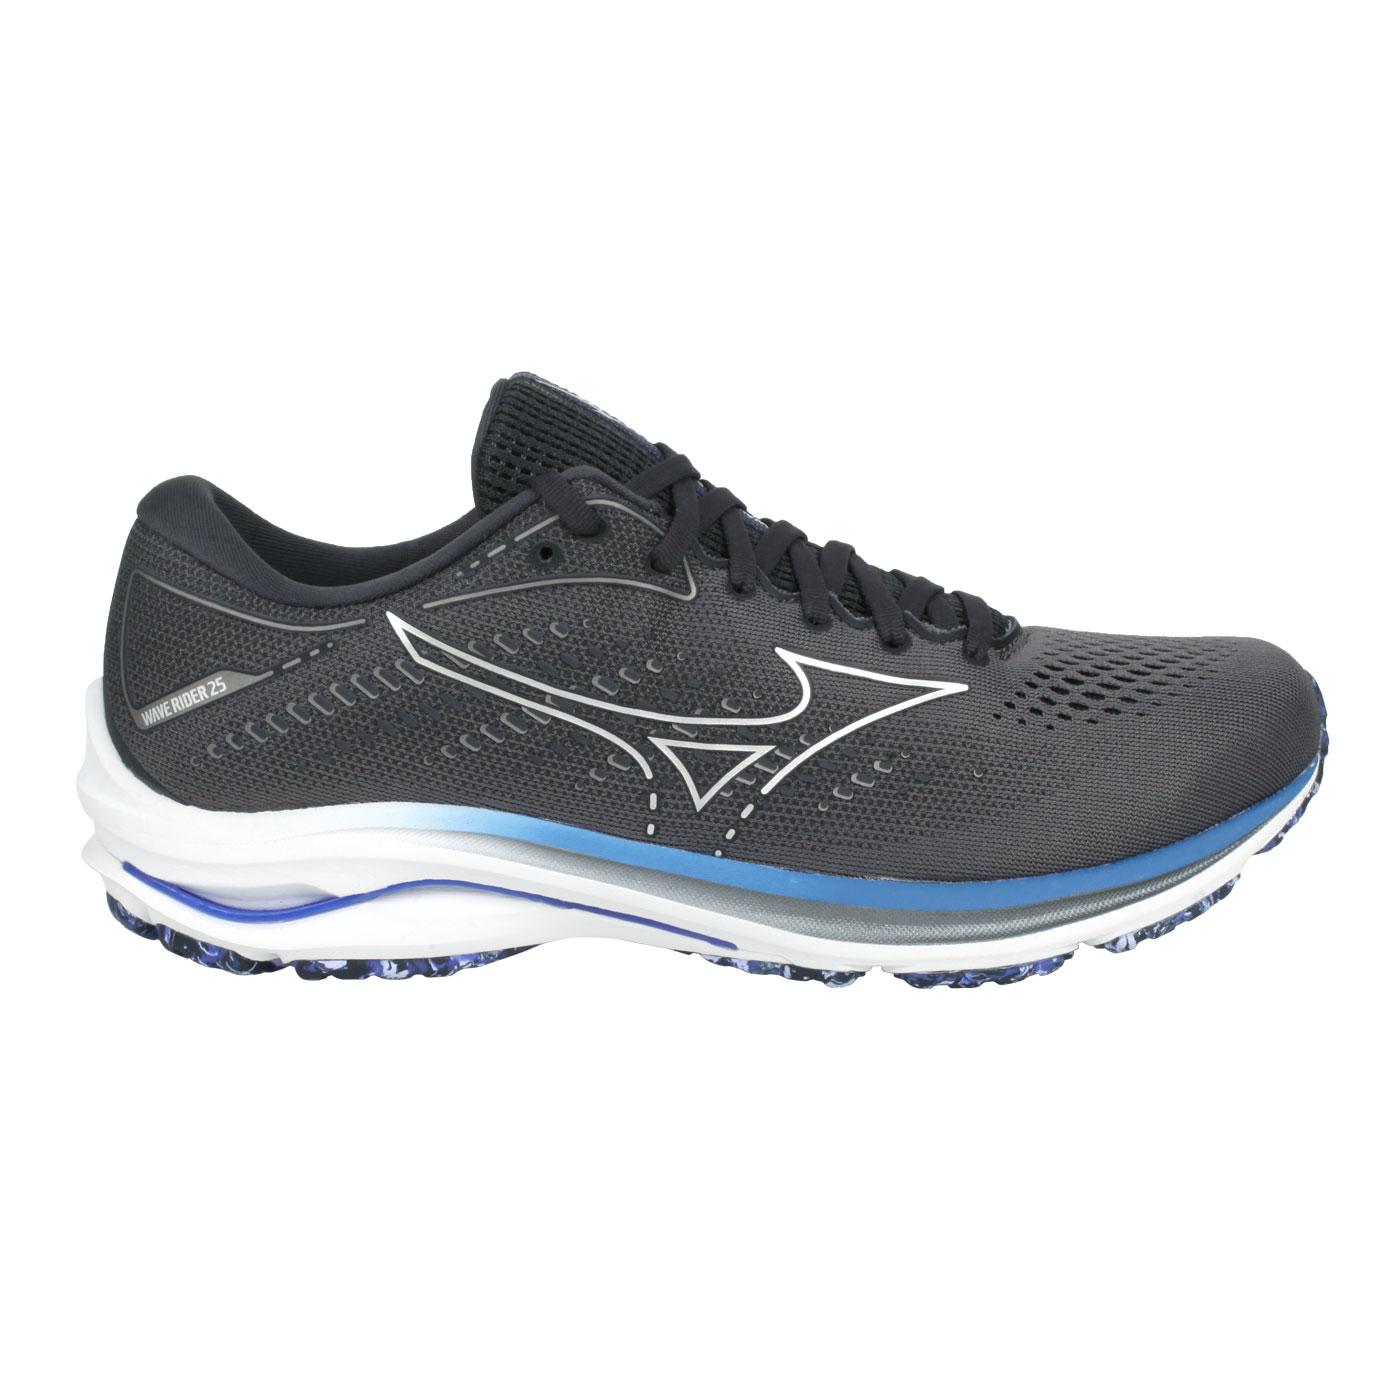 MIZUNO 男款慢跑鞋-4E  @WAVE RIDER 25 SW@J1GC210493 - 灰銀藍紫